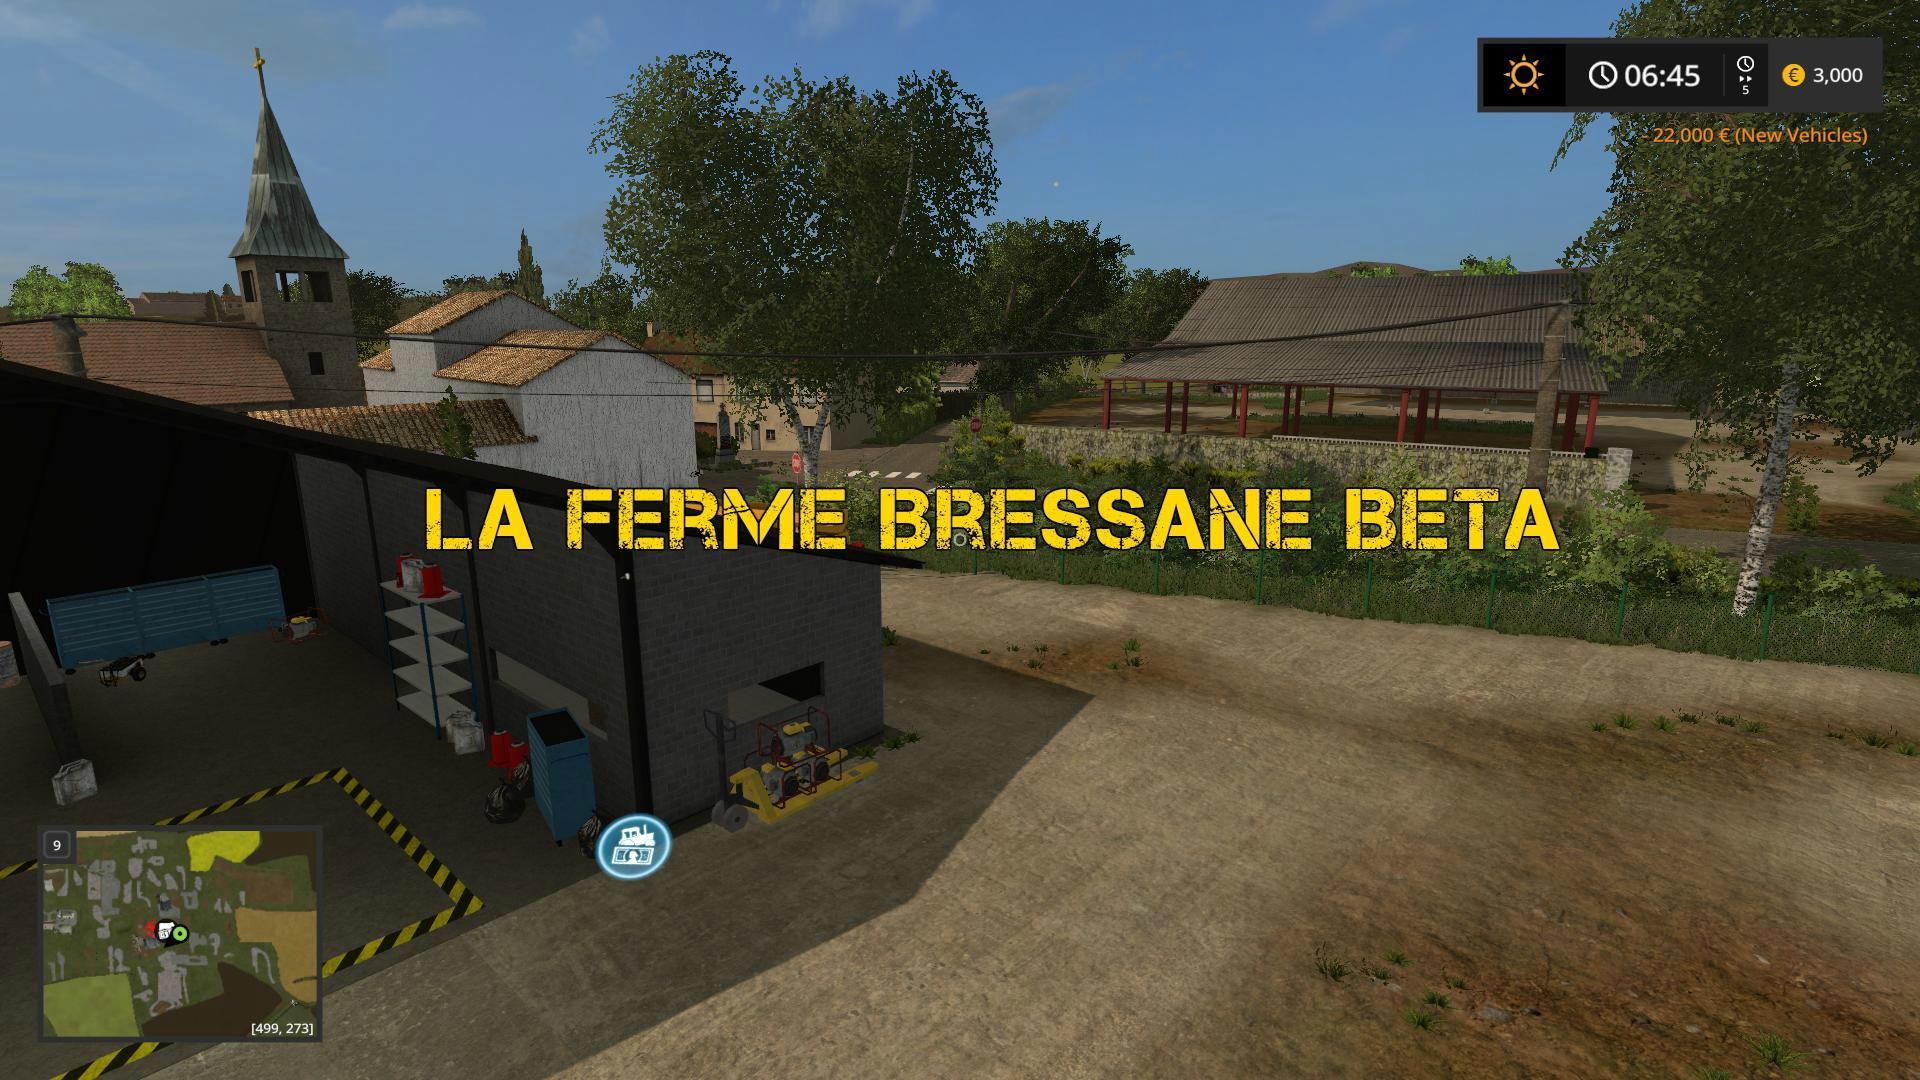 La Ferme Bressane BETA